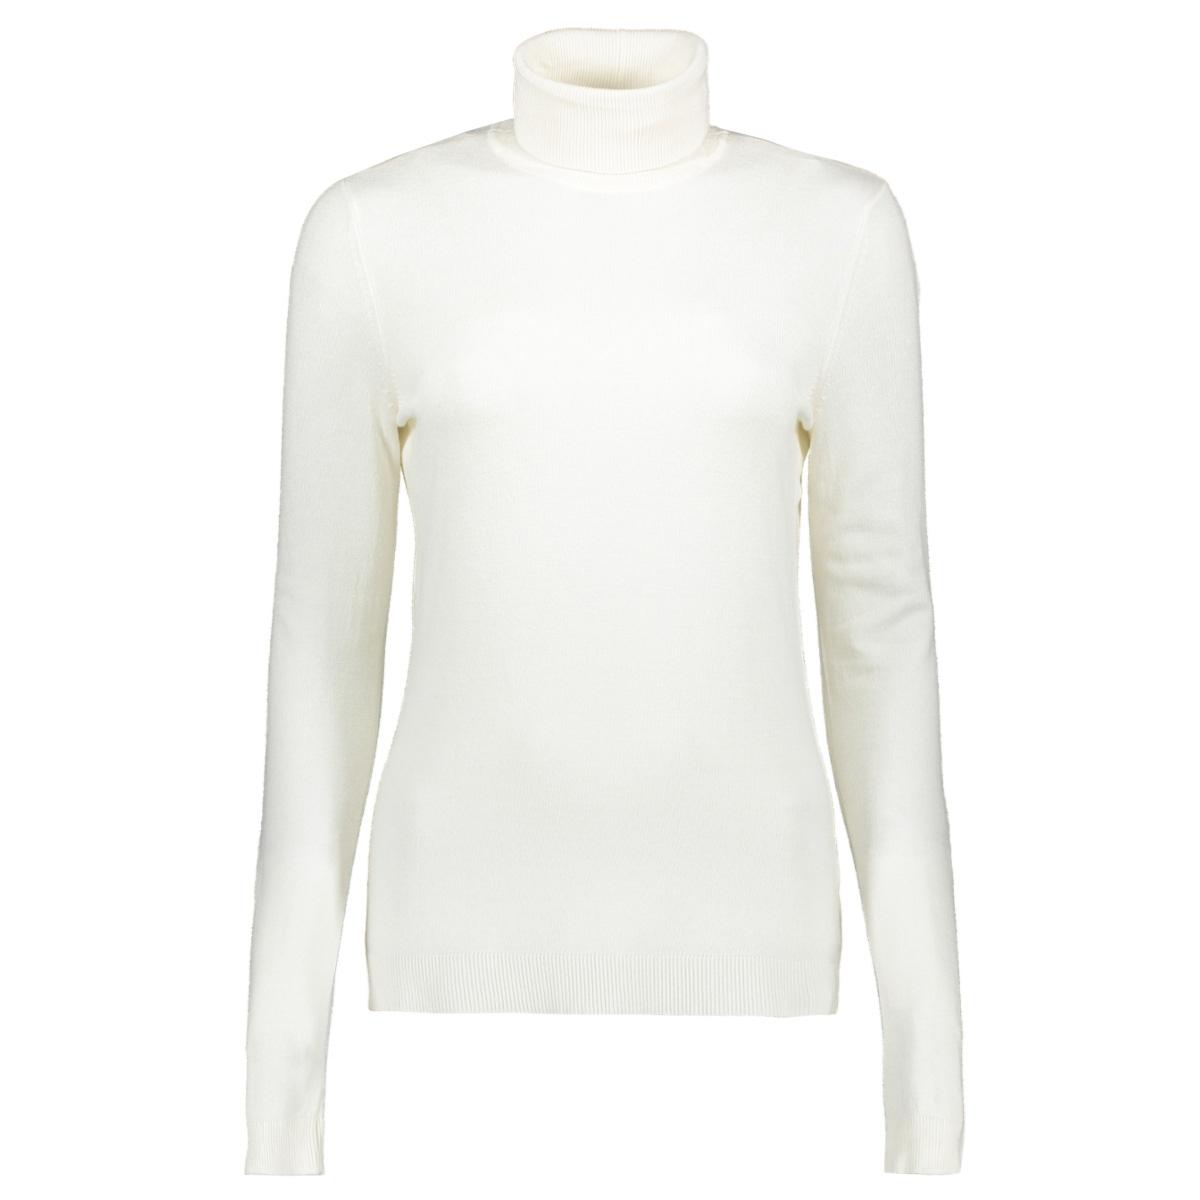 vibolonia knit l/s rollneck top-fav 14055711 vila trui whisper white